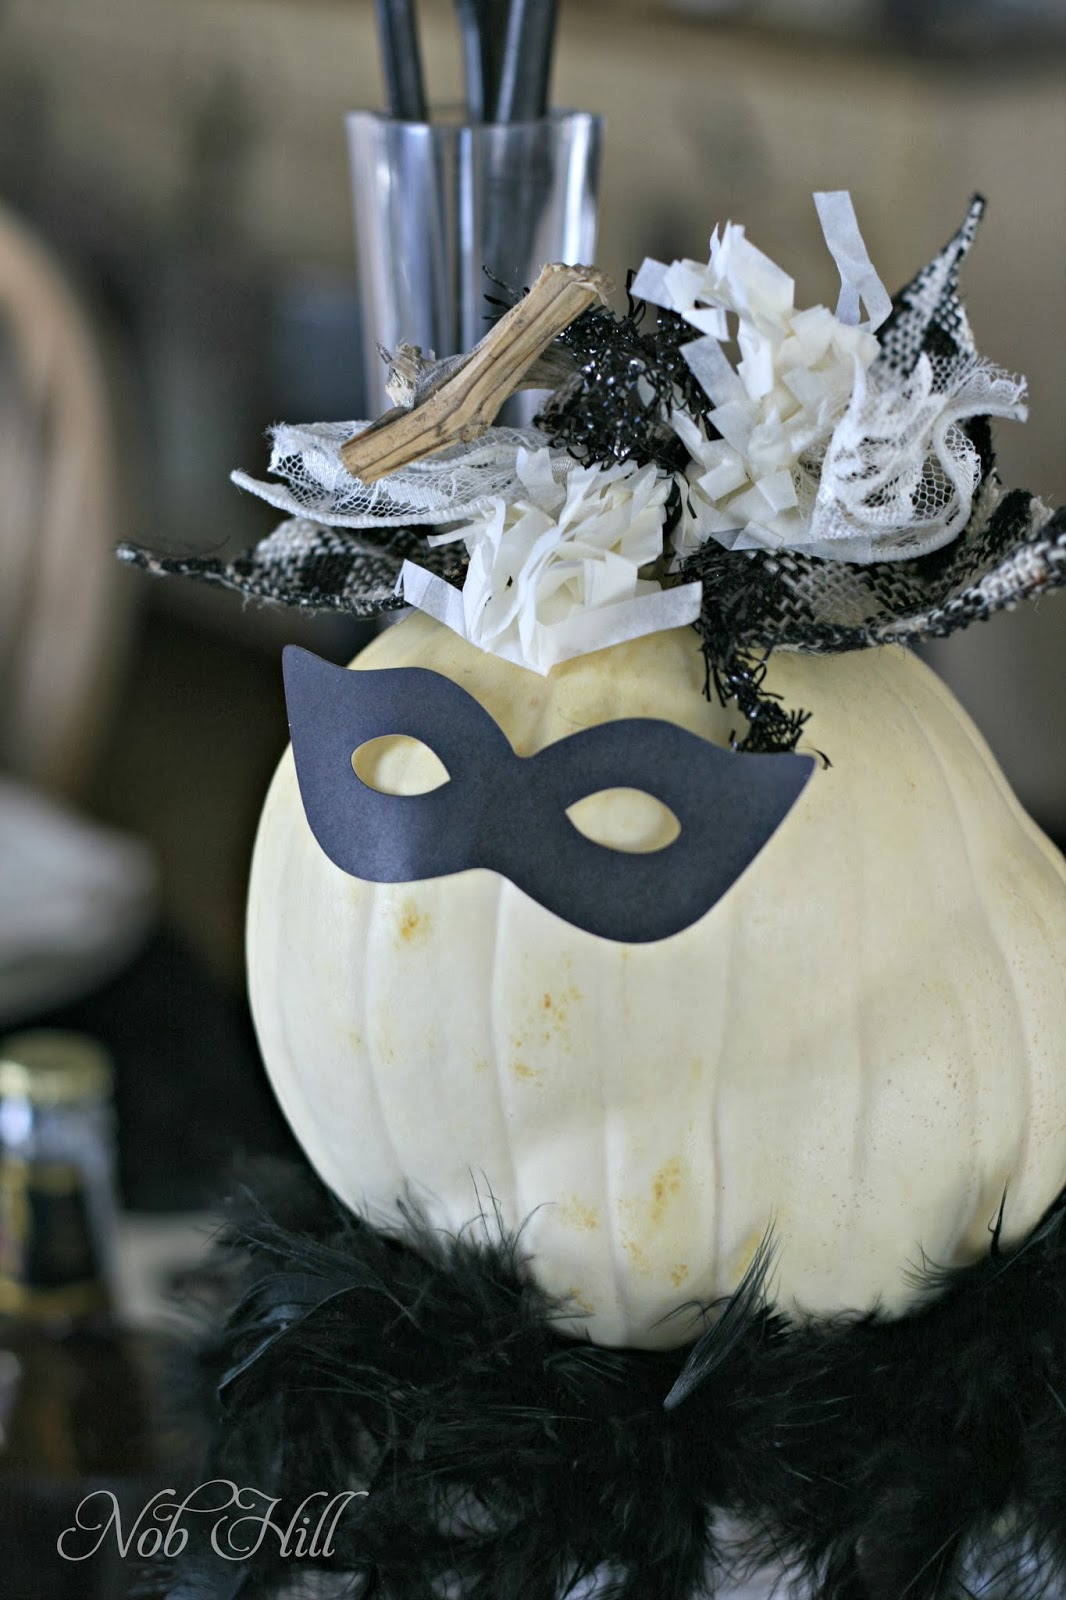 Nob Hill: Masquerade Halloween Dinner Party